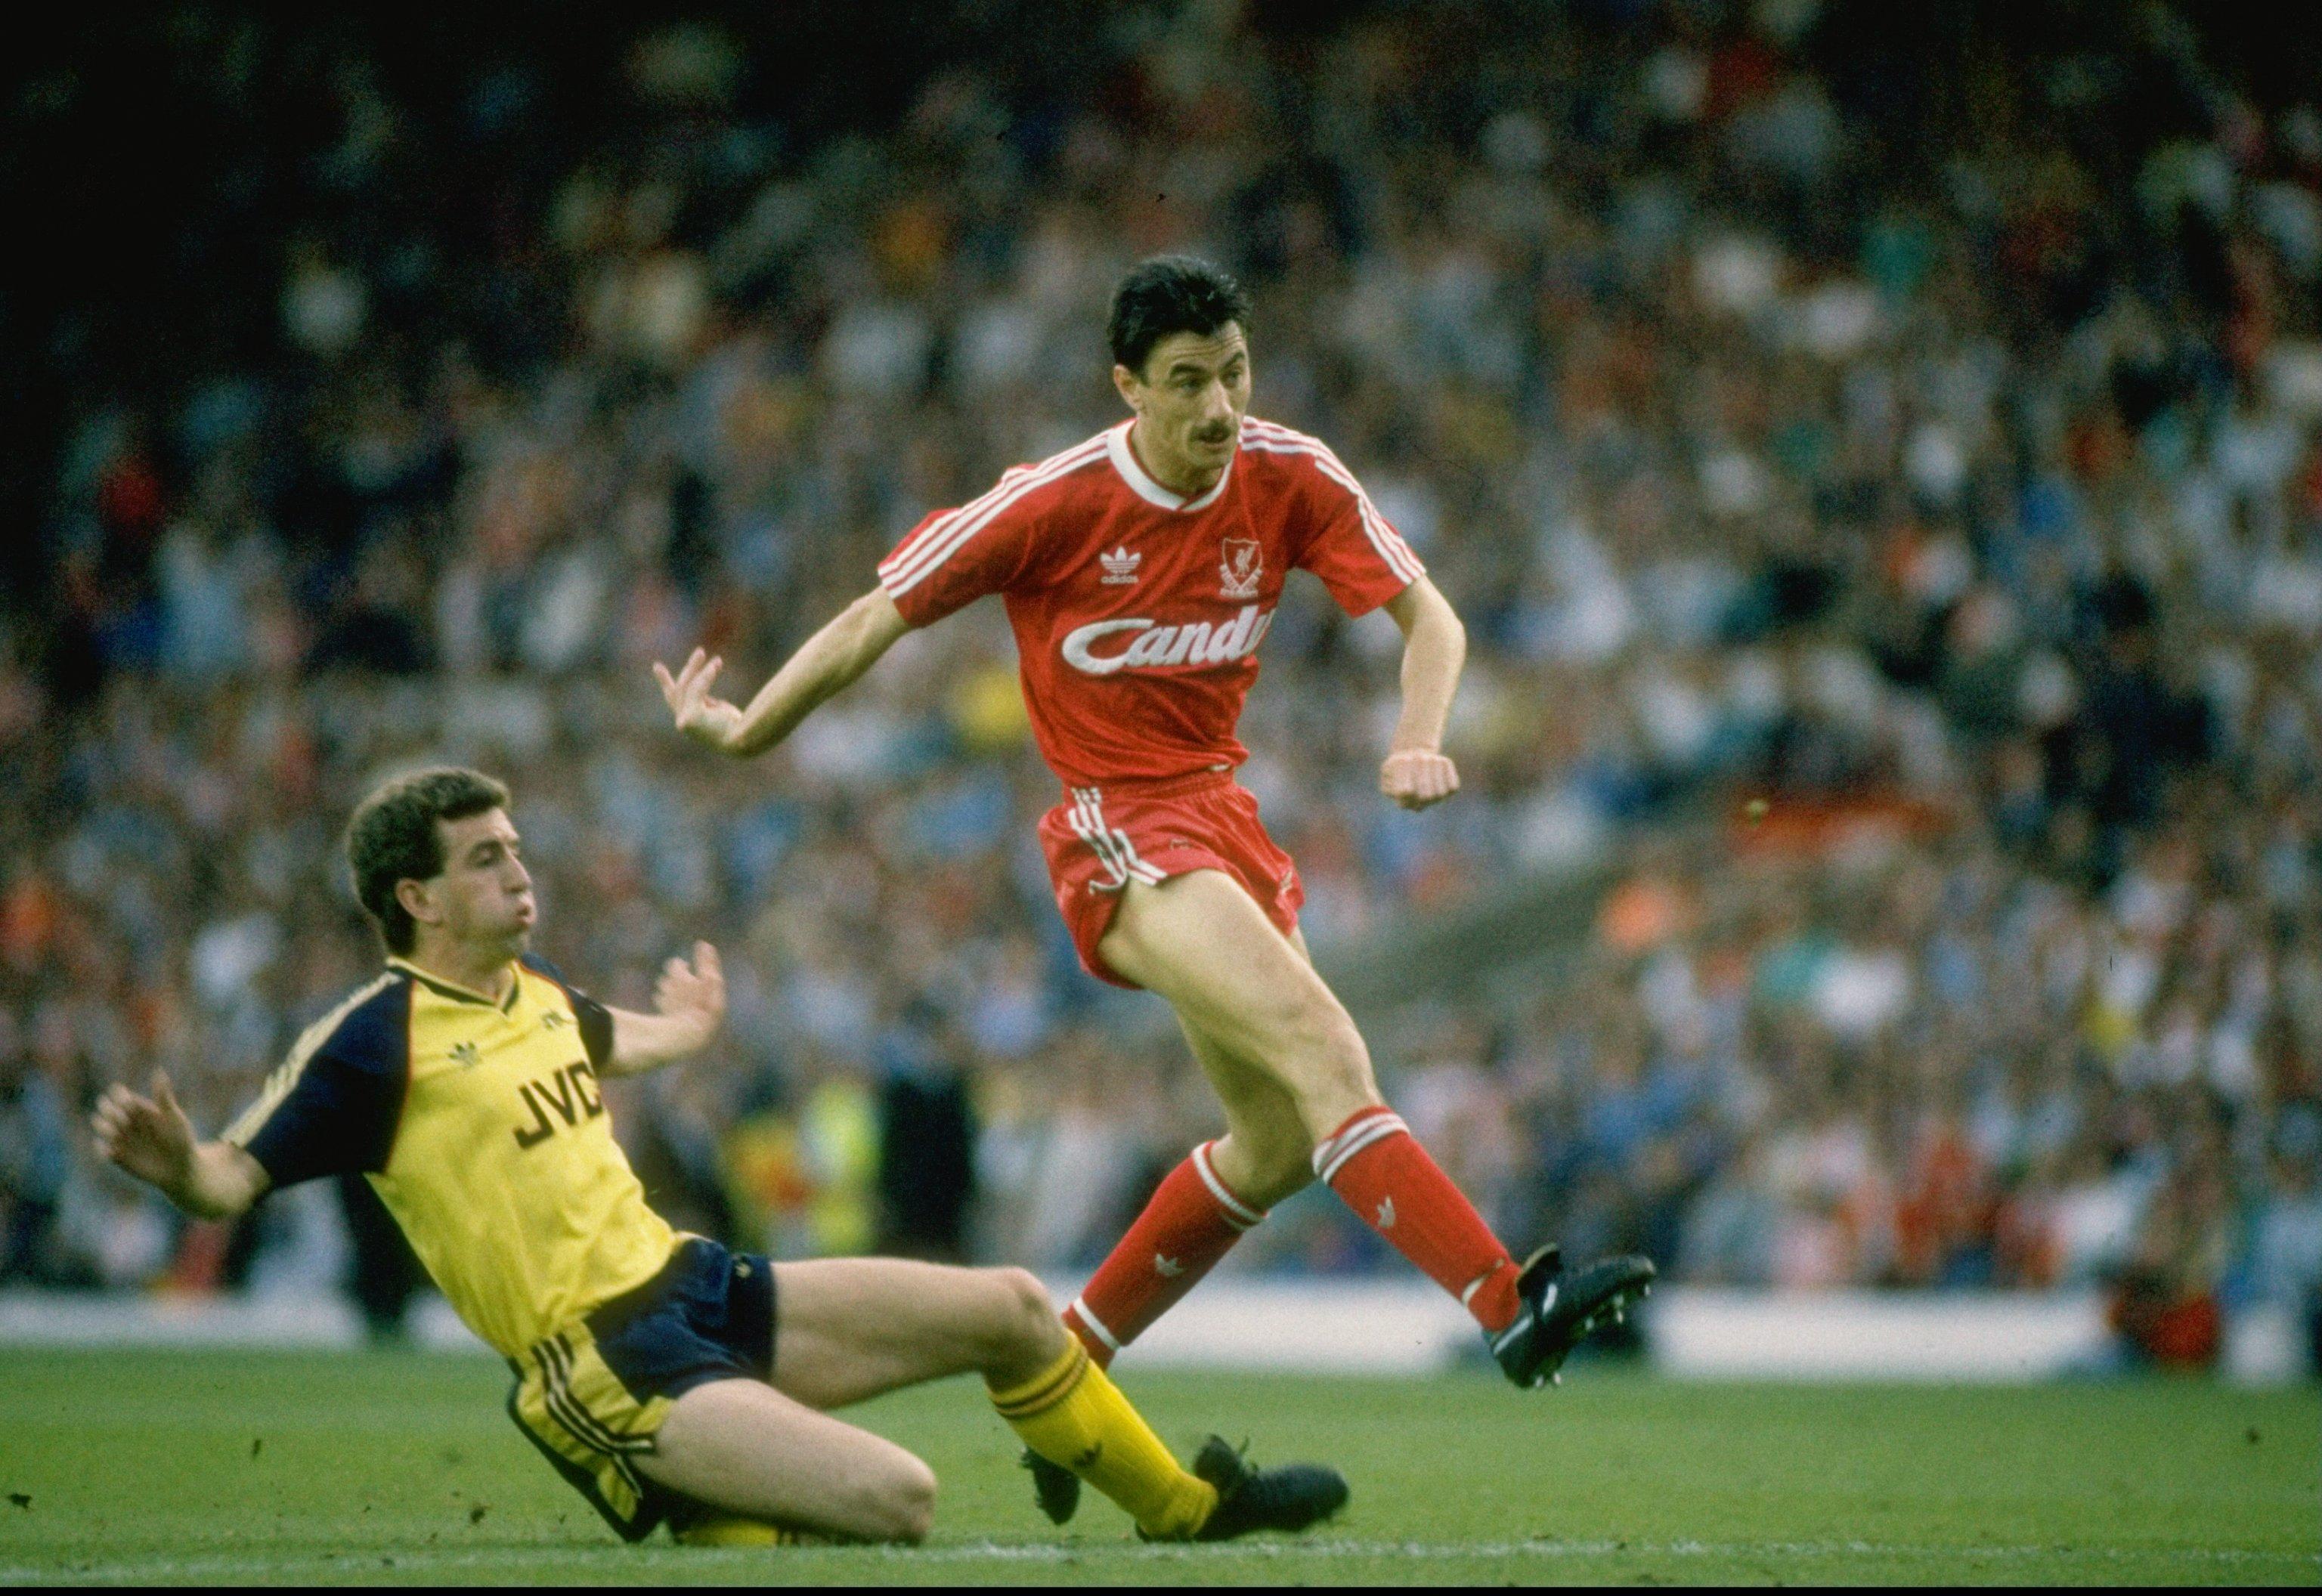 Liverpool Arsenal 051989 Ian Rush Nigel Winterburn